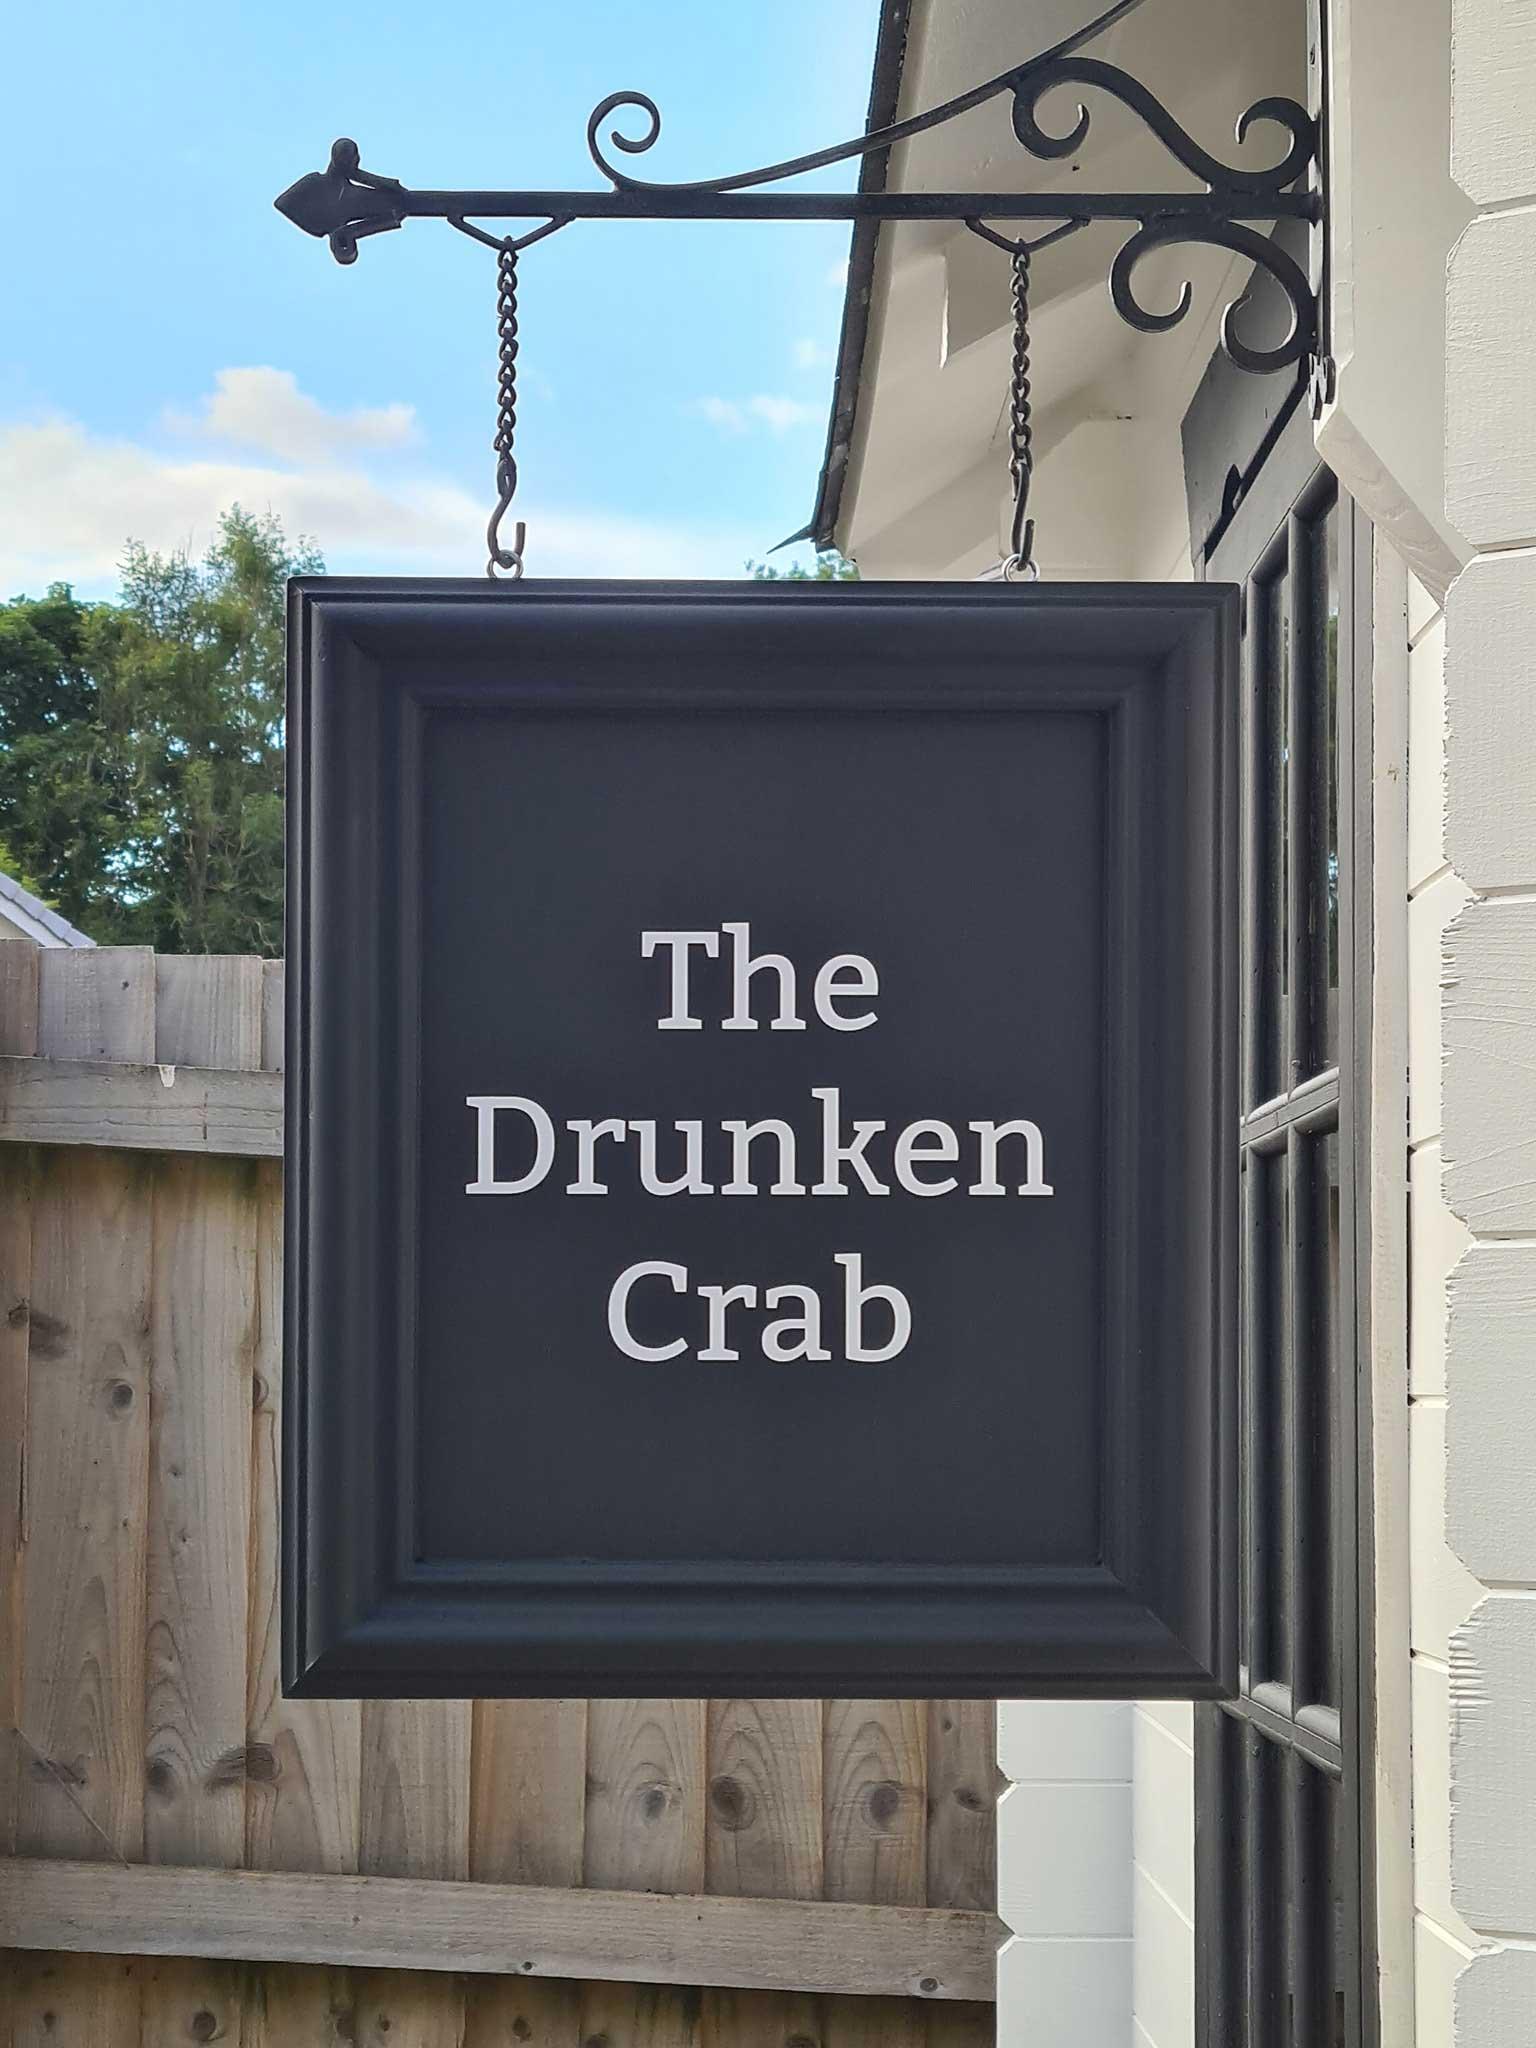 DIY-Mini-Pub im eigenen Garten gebaut the-drunken-crab-privater-pub_09